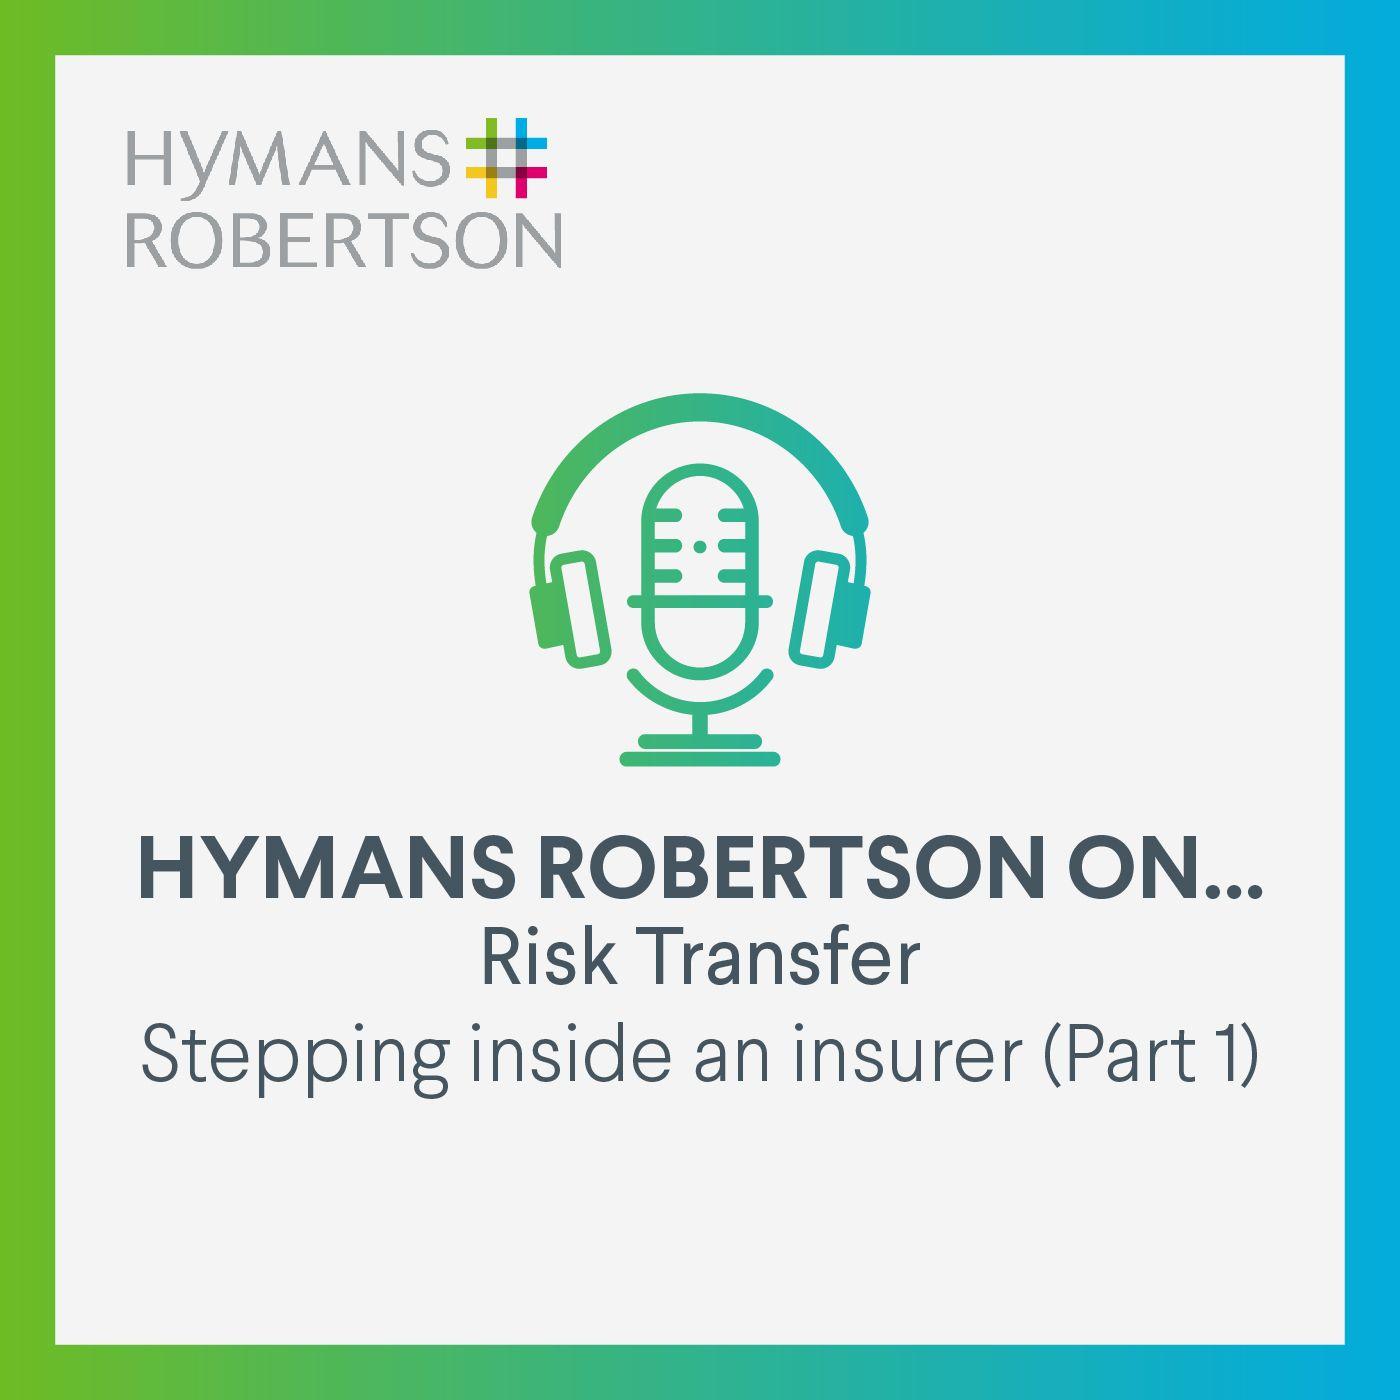 Risk Transfer – Stepping inside an insurer (Part 1) – Episode 2